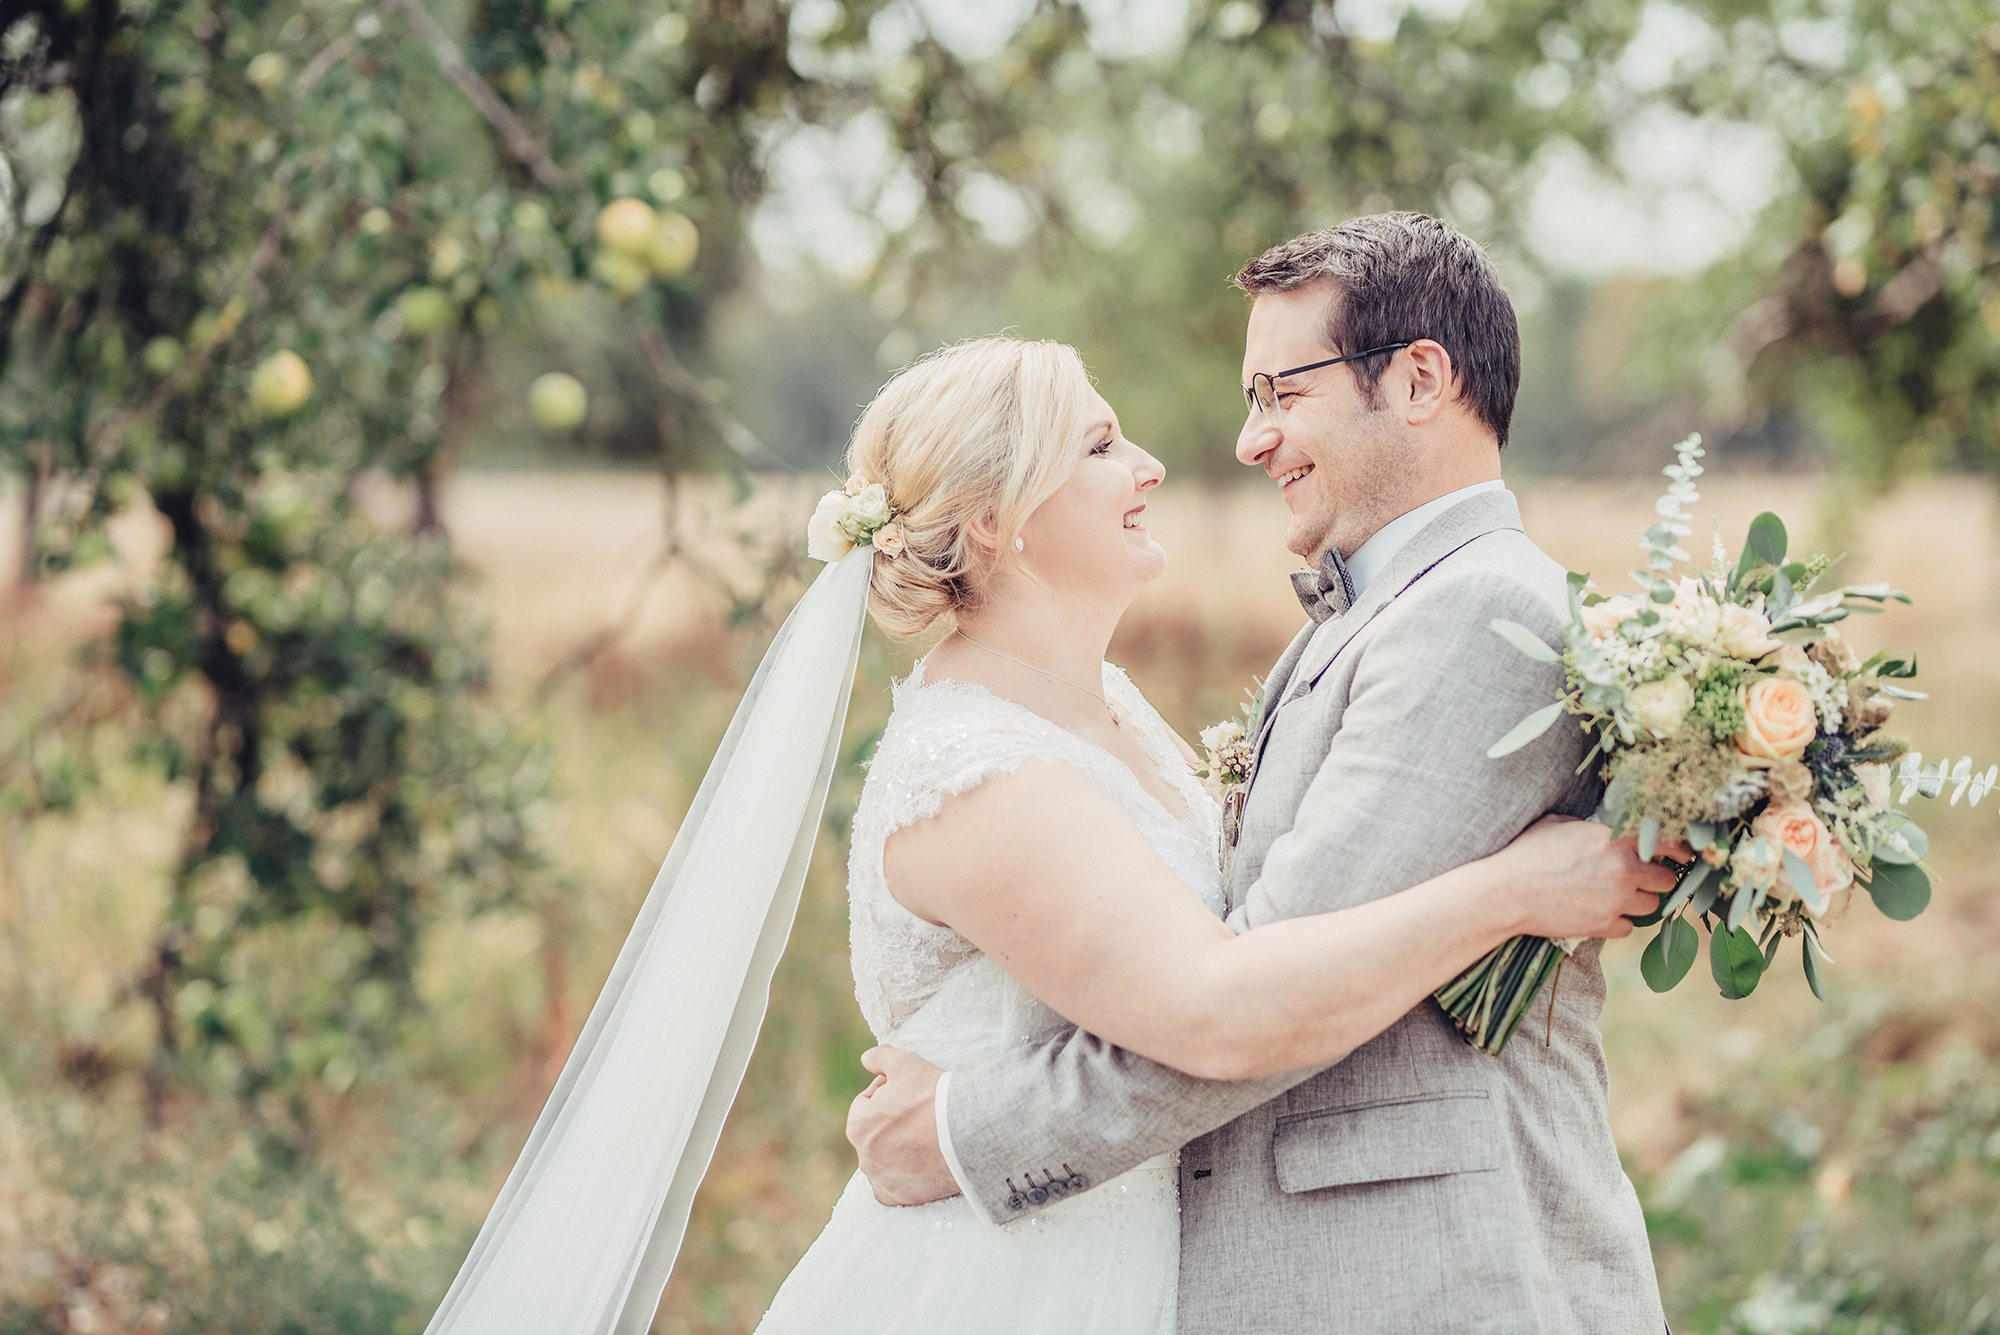 weddingseptemberluminoxx92348234207